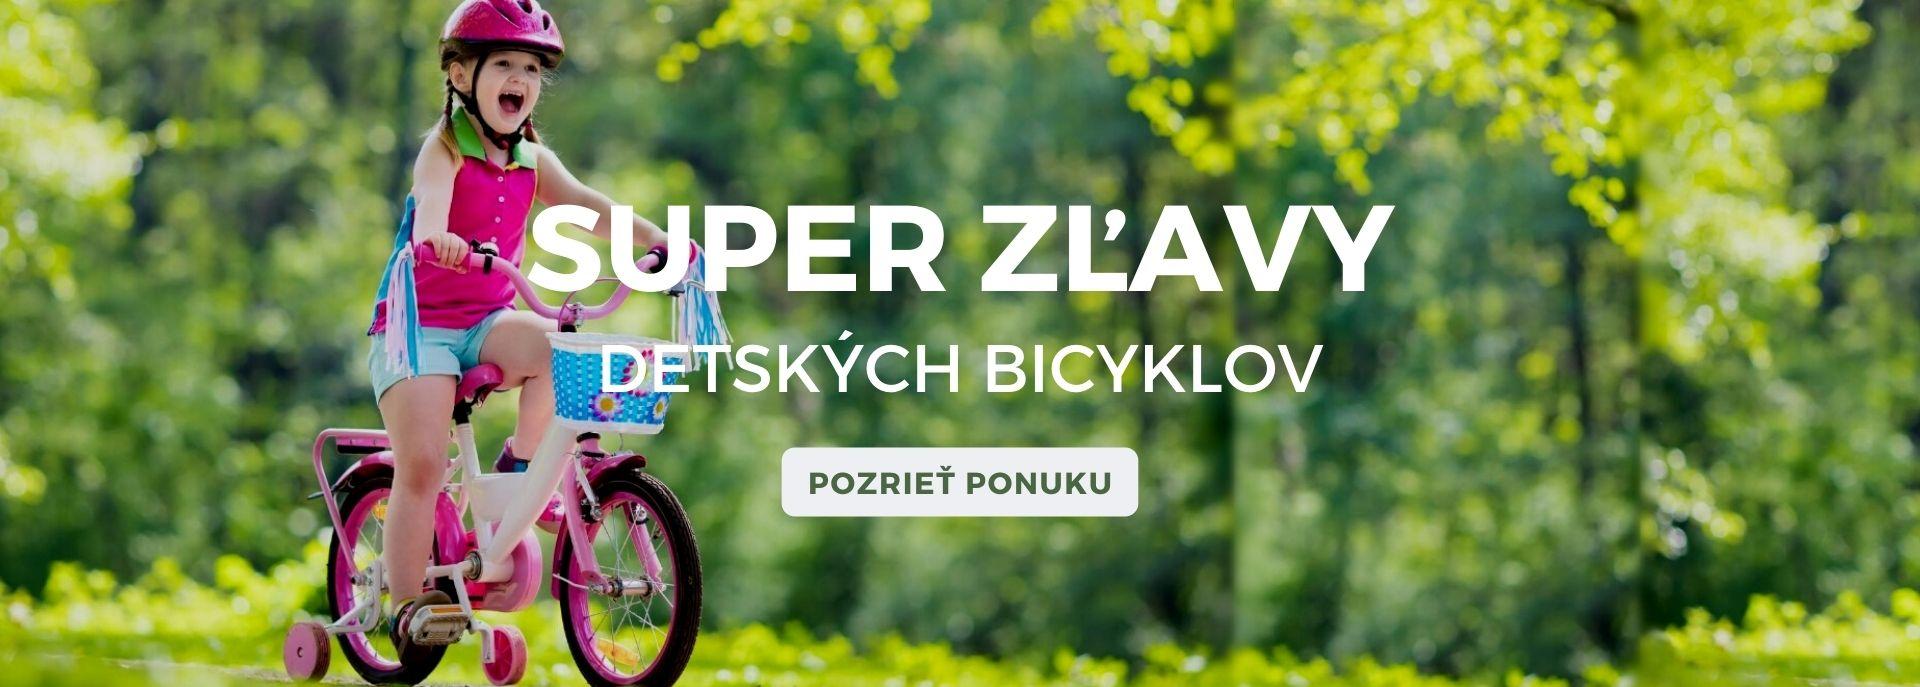 detské bike